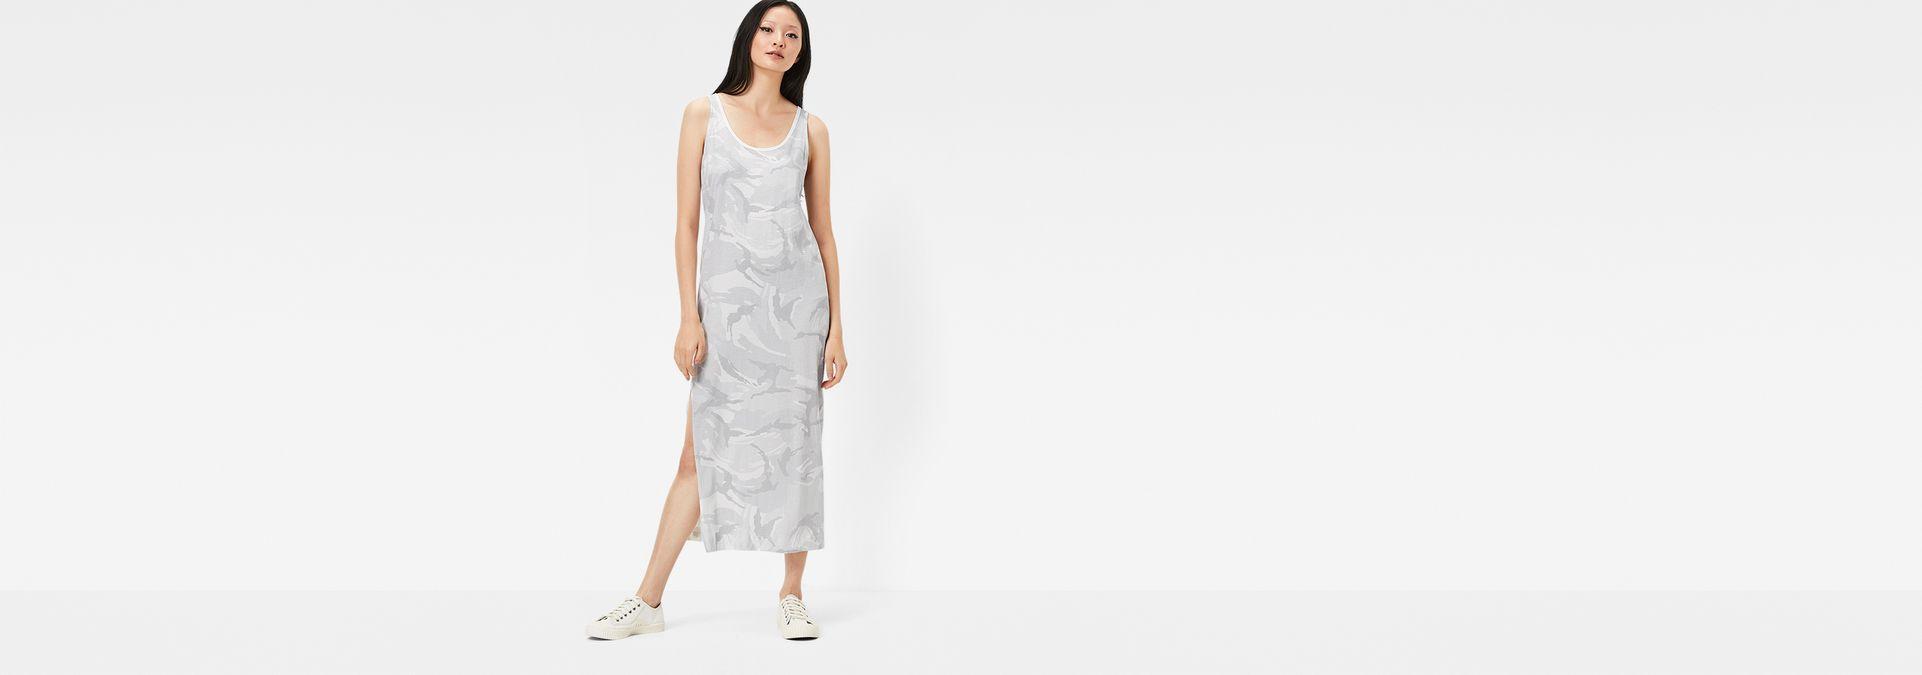 Lyker Tank Top Dress Milk Industrial Grey G Star Raw